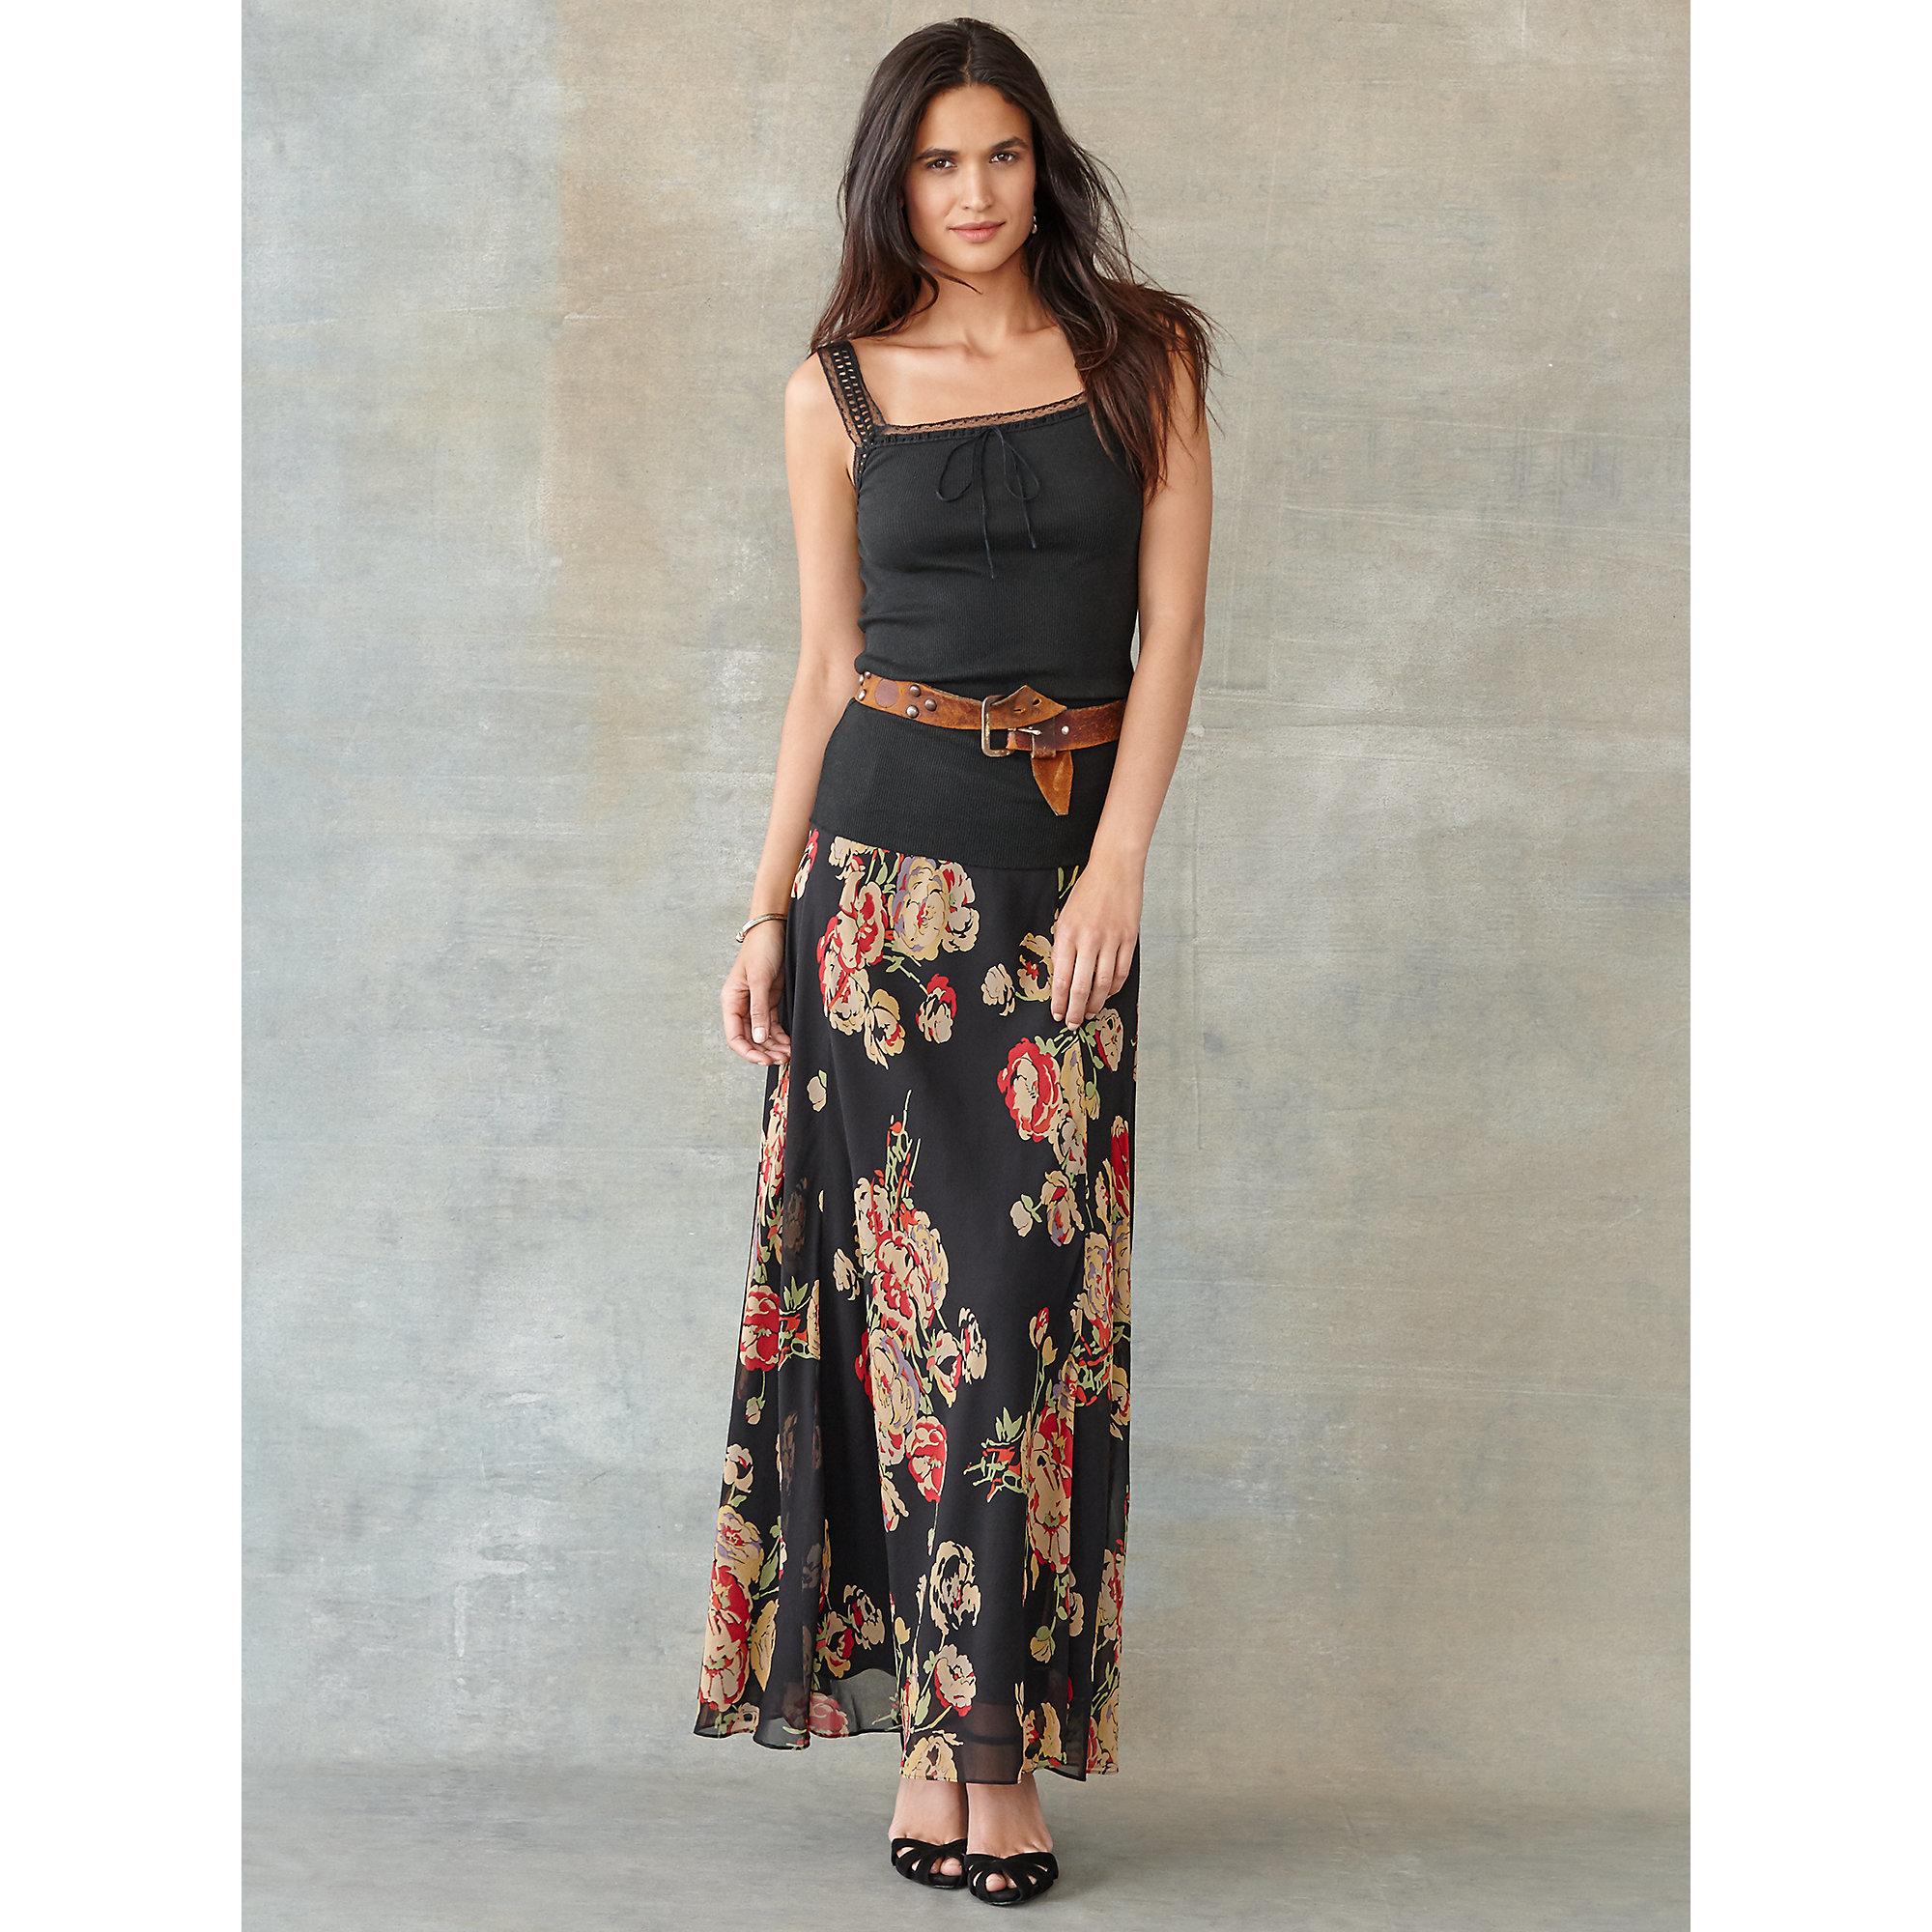 Rrl Becket Floral Silk Maxiskirt in Black | Lyst